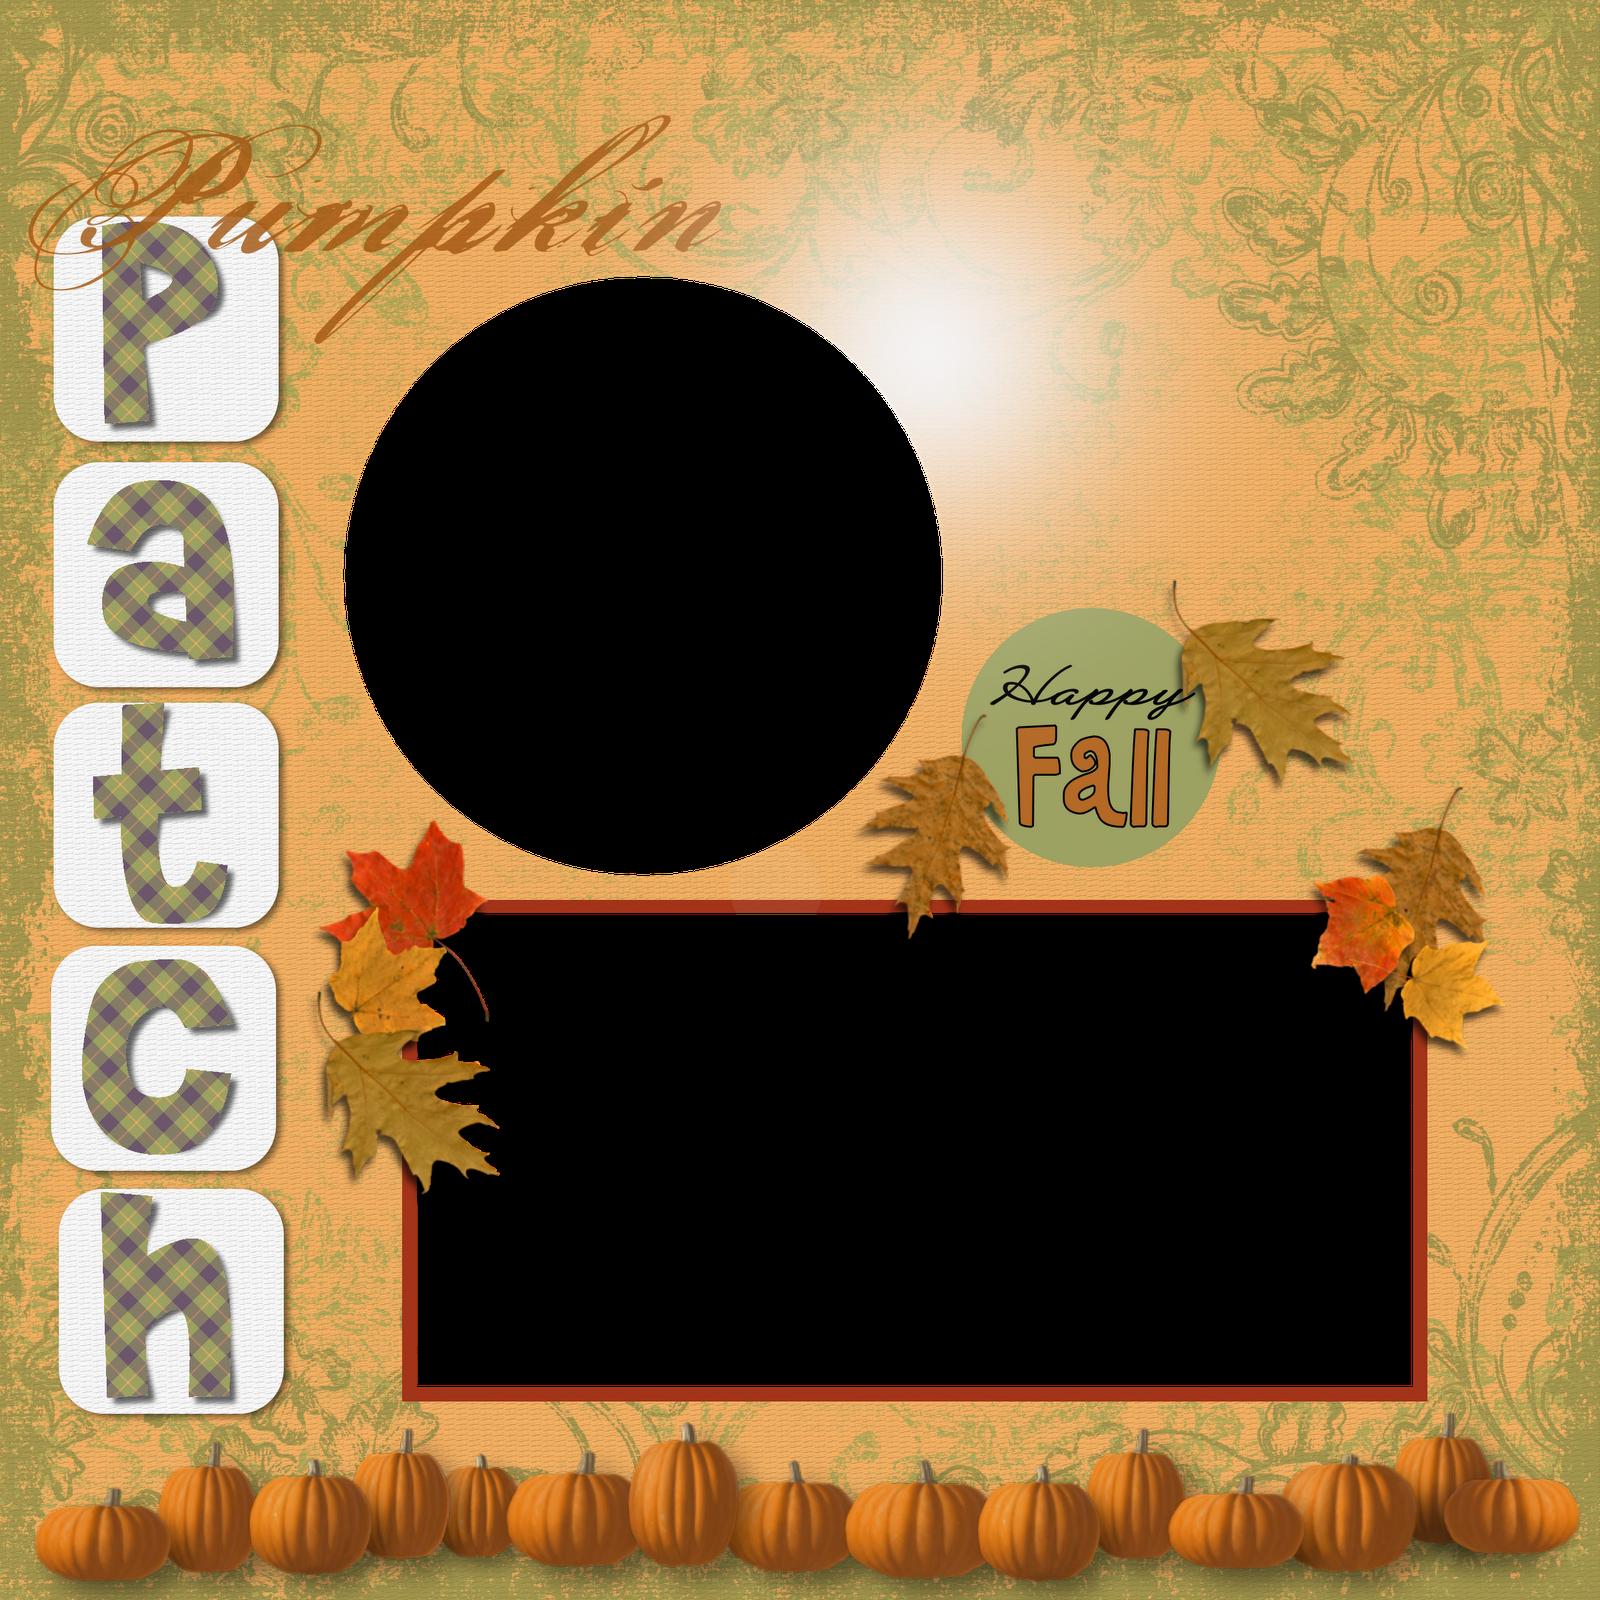 Pumpkin patch clipart vintage clip art transparent Adele Lark Vintage Design: New! Free Pumpkin Patch Quick Page clip art transparent